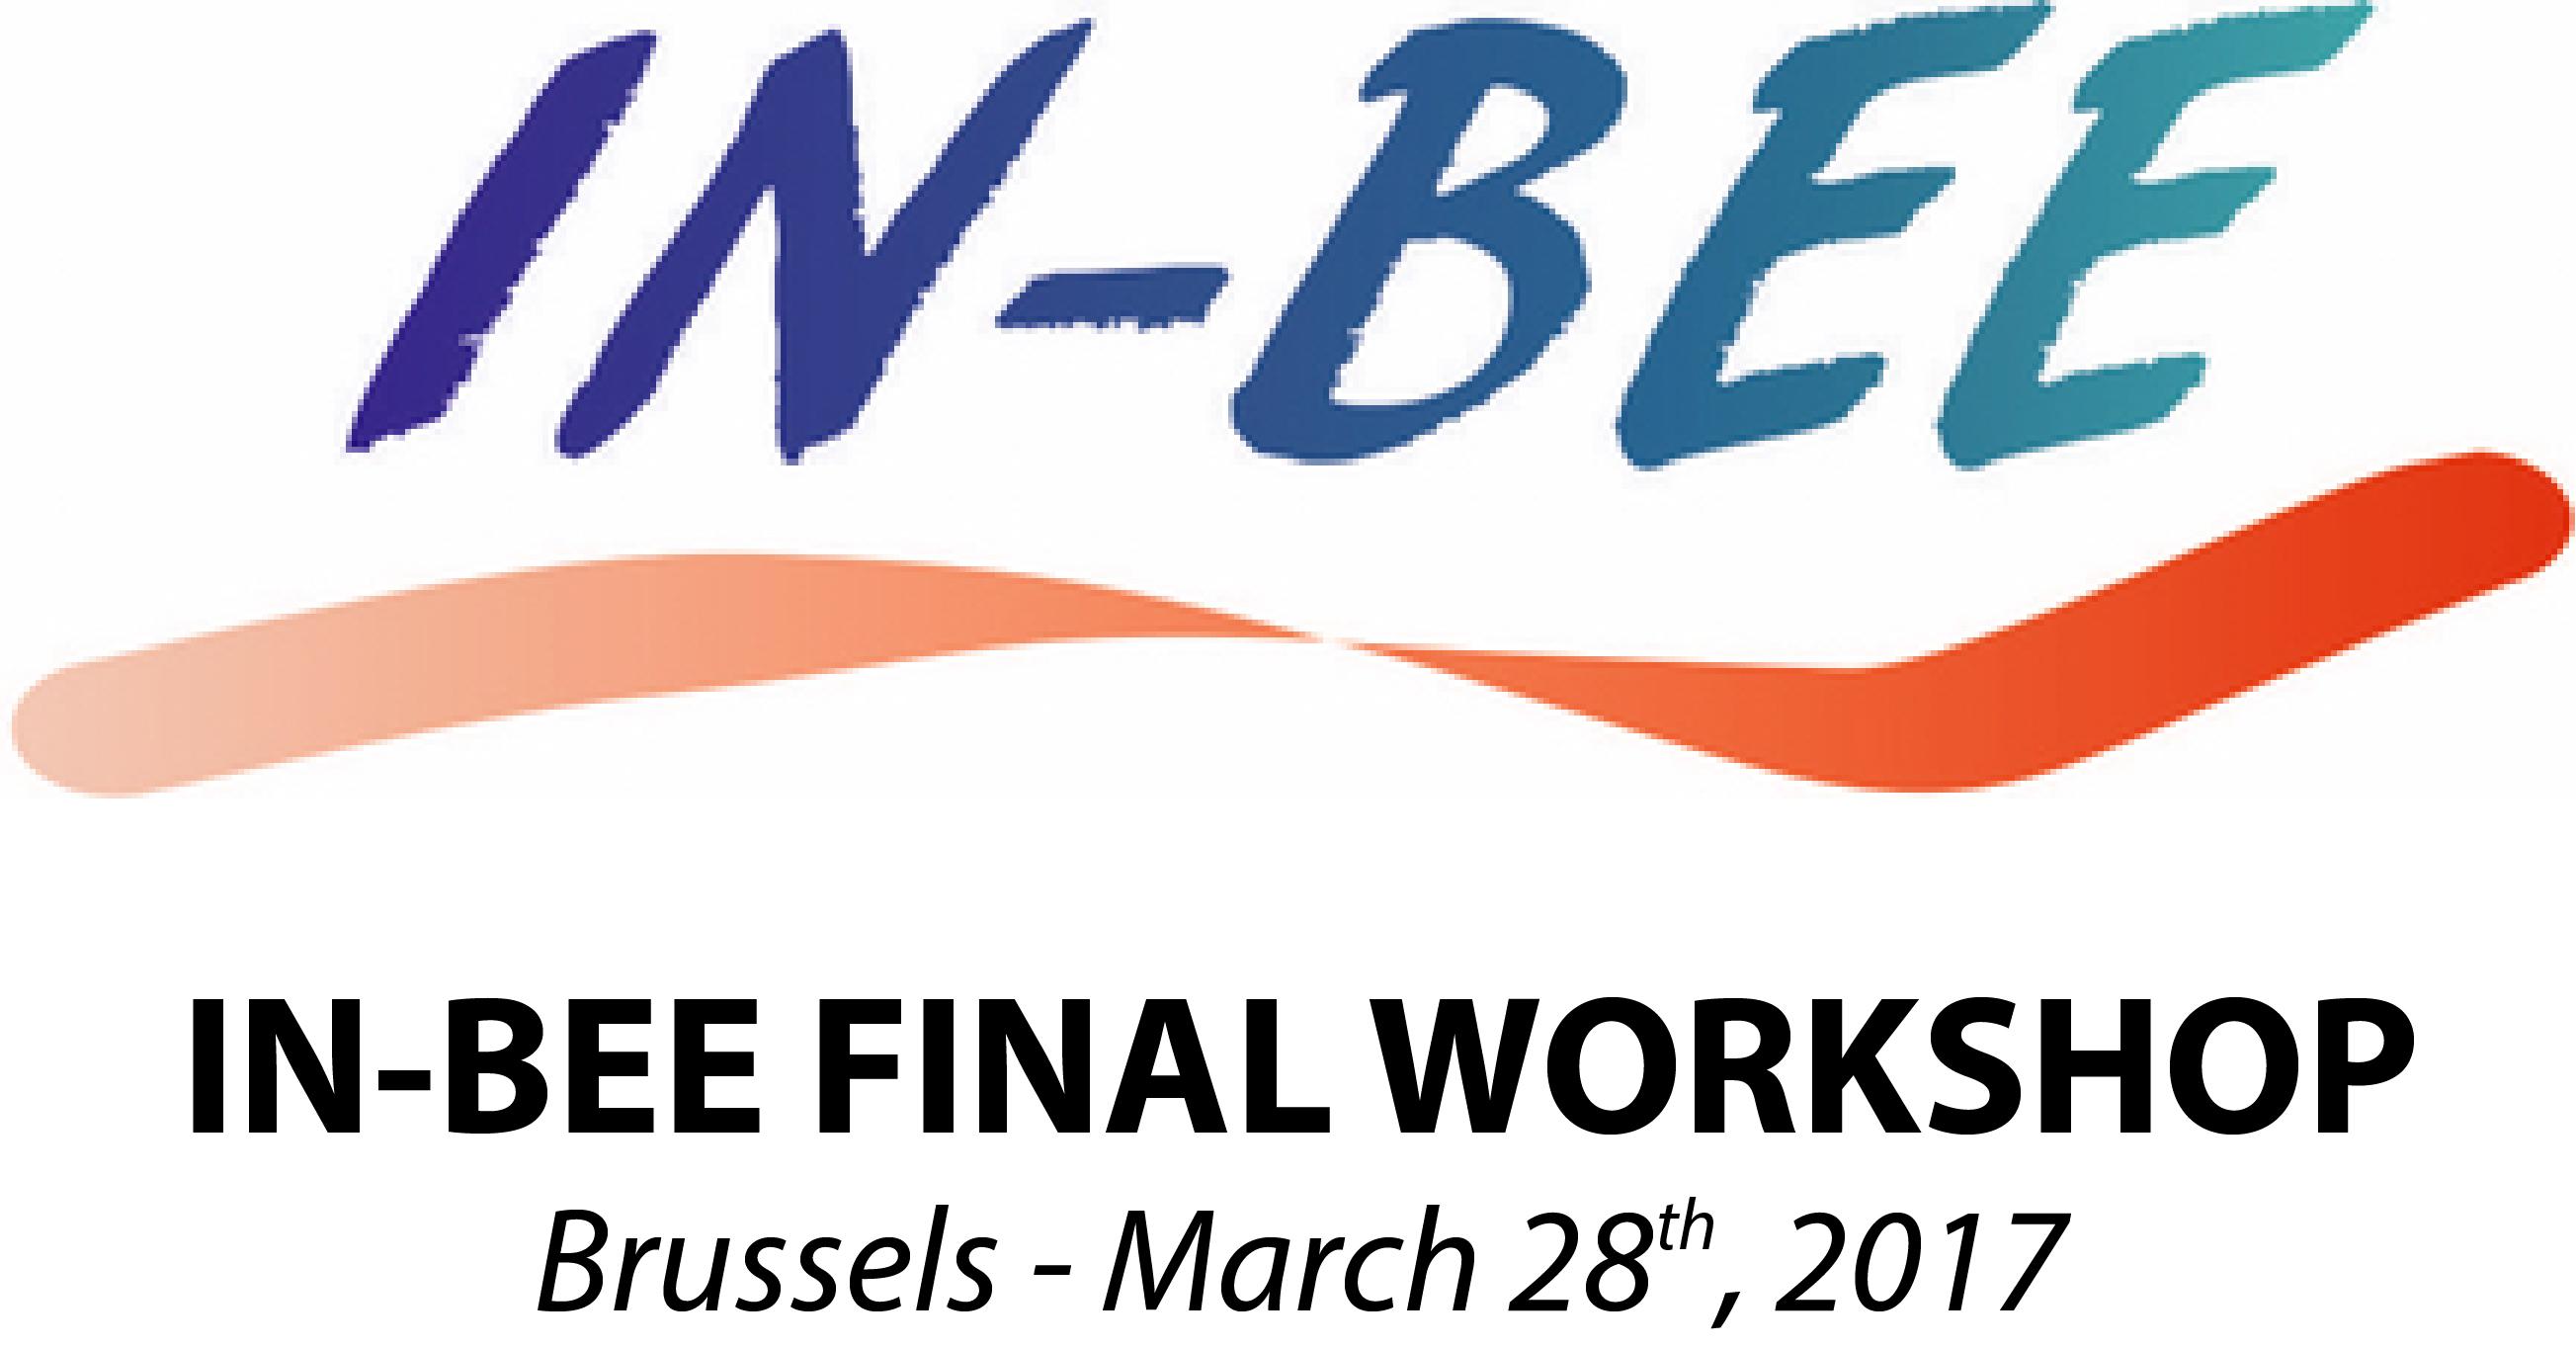 IN-BEE final workshop